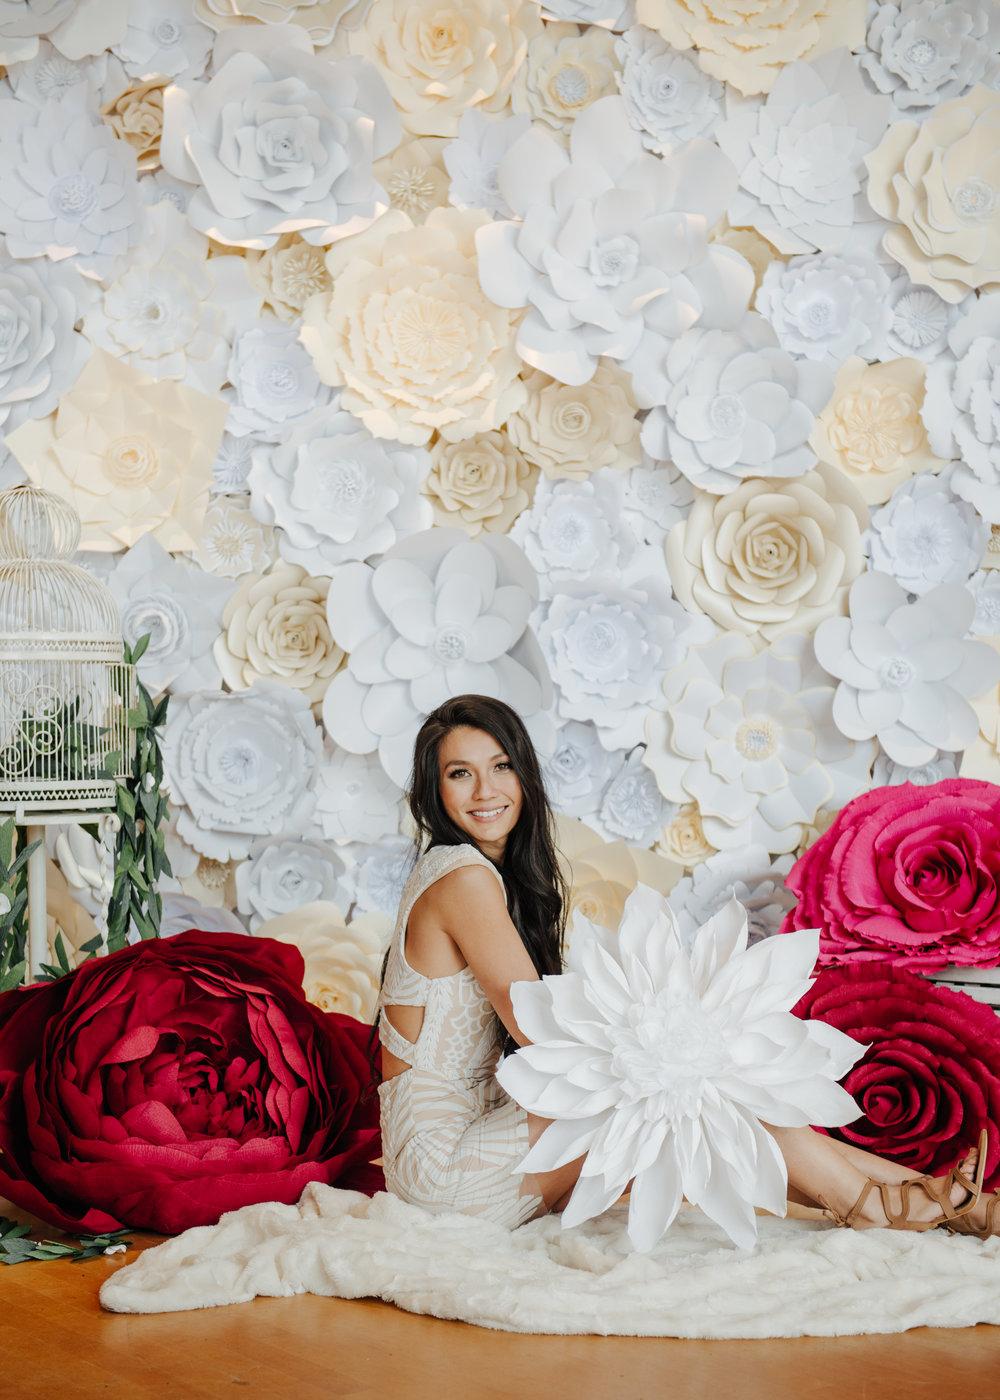 kaoverii_silva_photographer_paper_florist-15.jpg